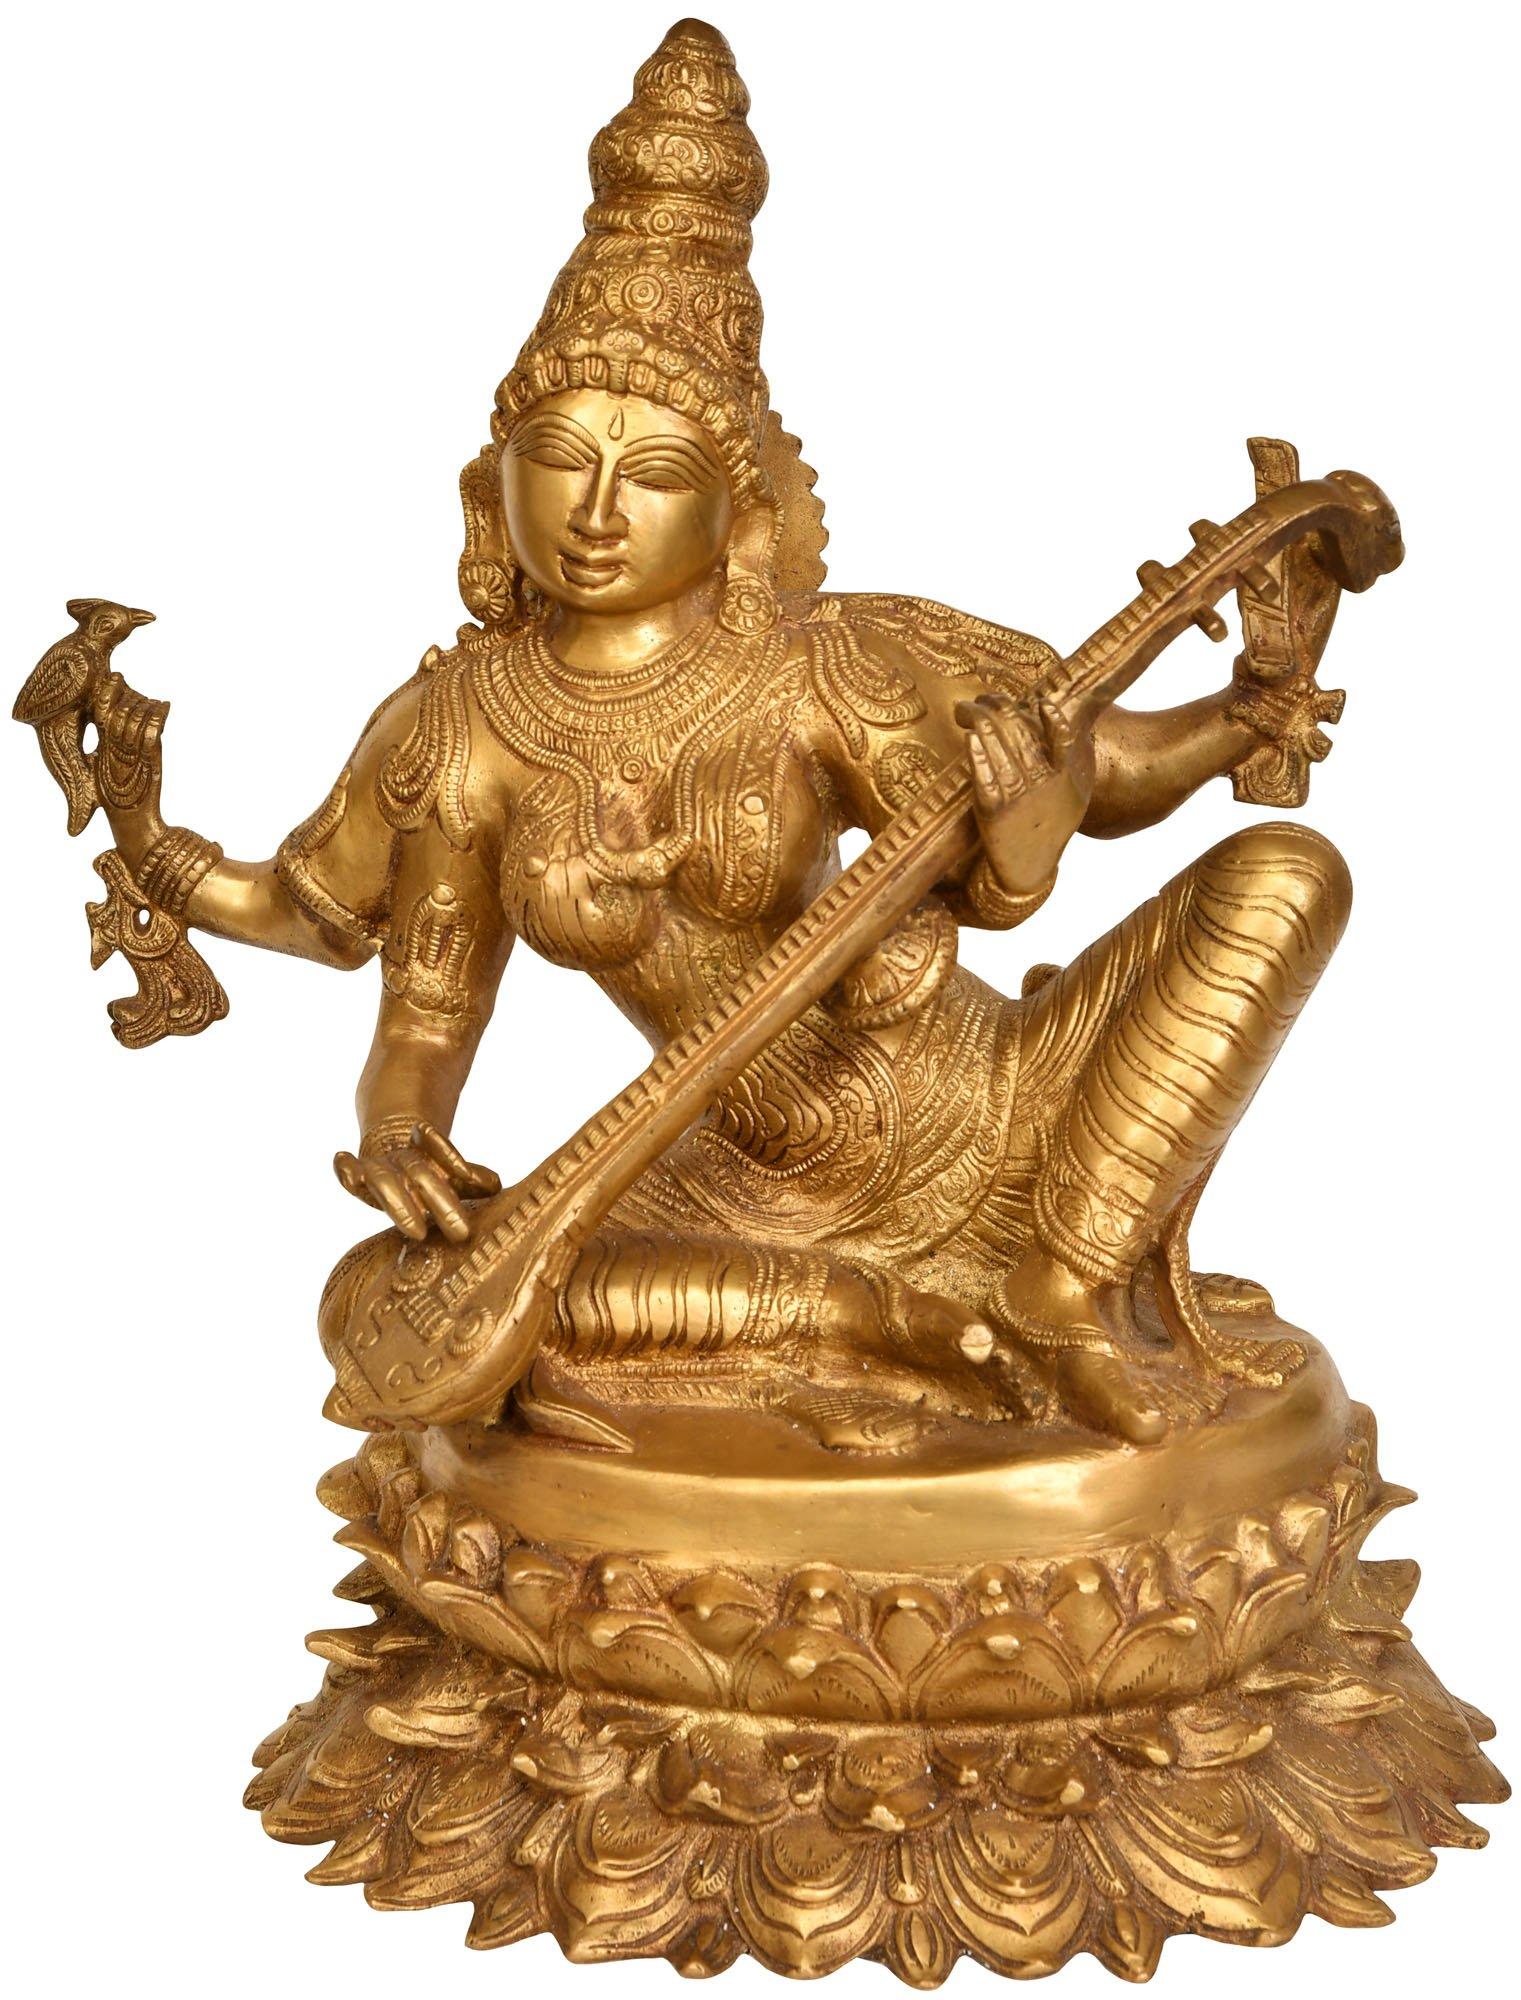 c816b97d405 Four-Armed Goddess Saraswati